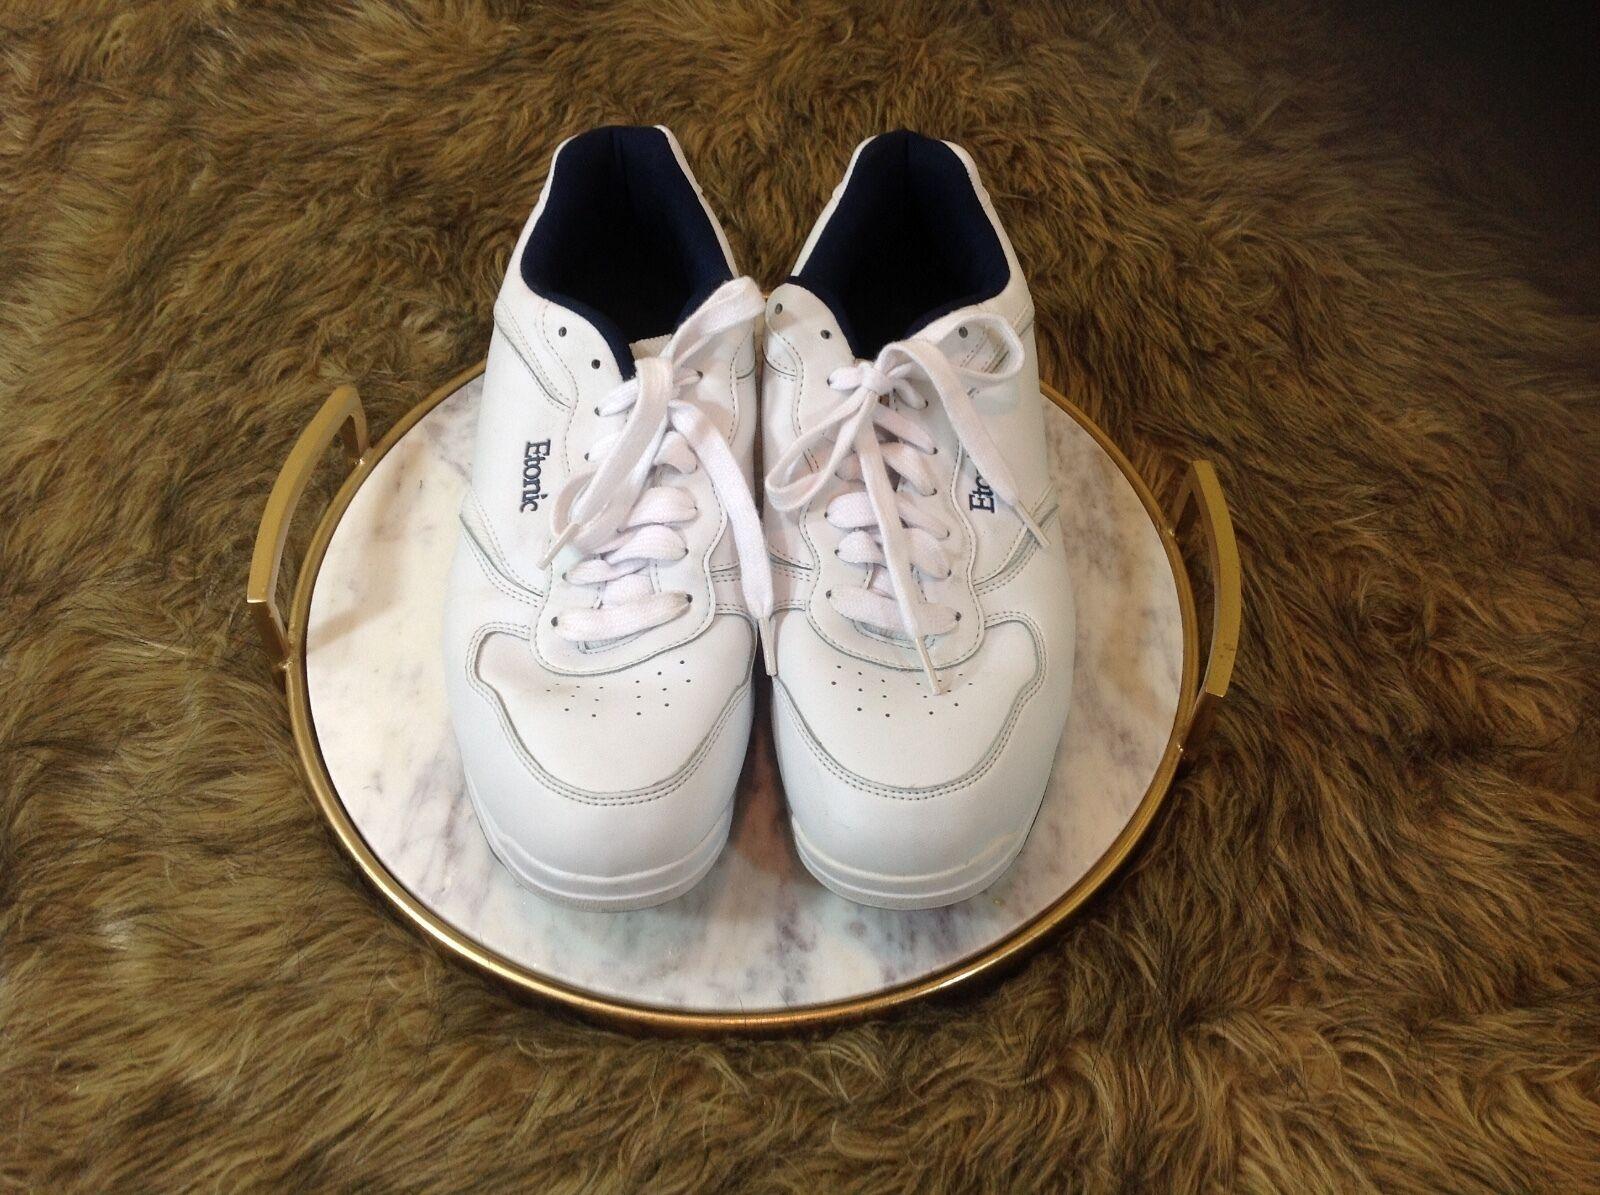 Etonic Perfect Slide White Mens Bowling Shoes Size 11.5